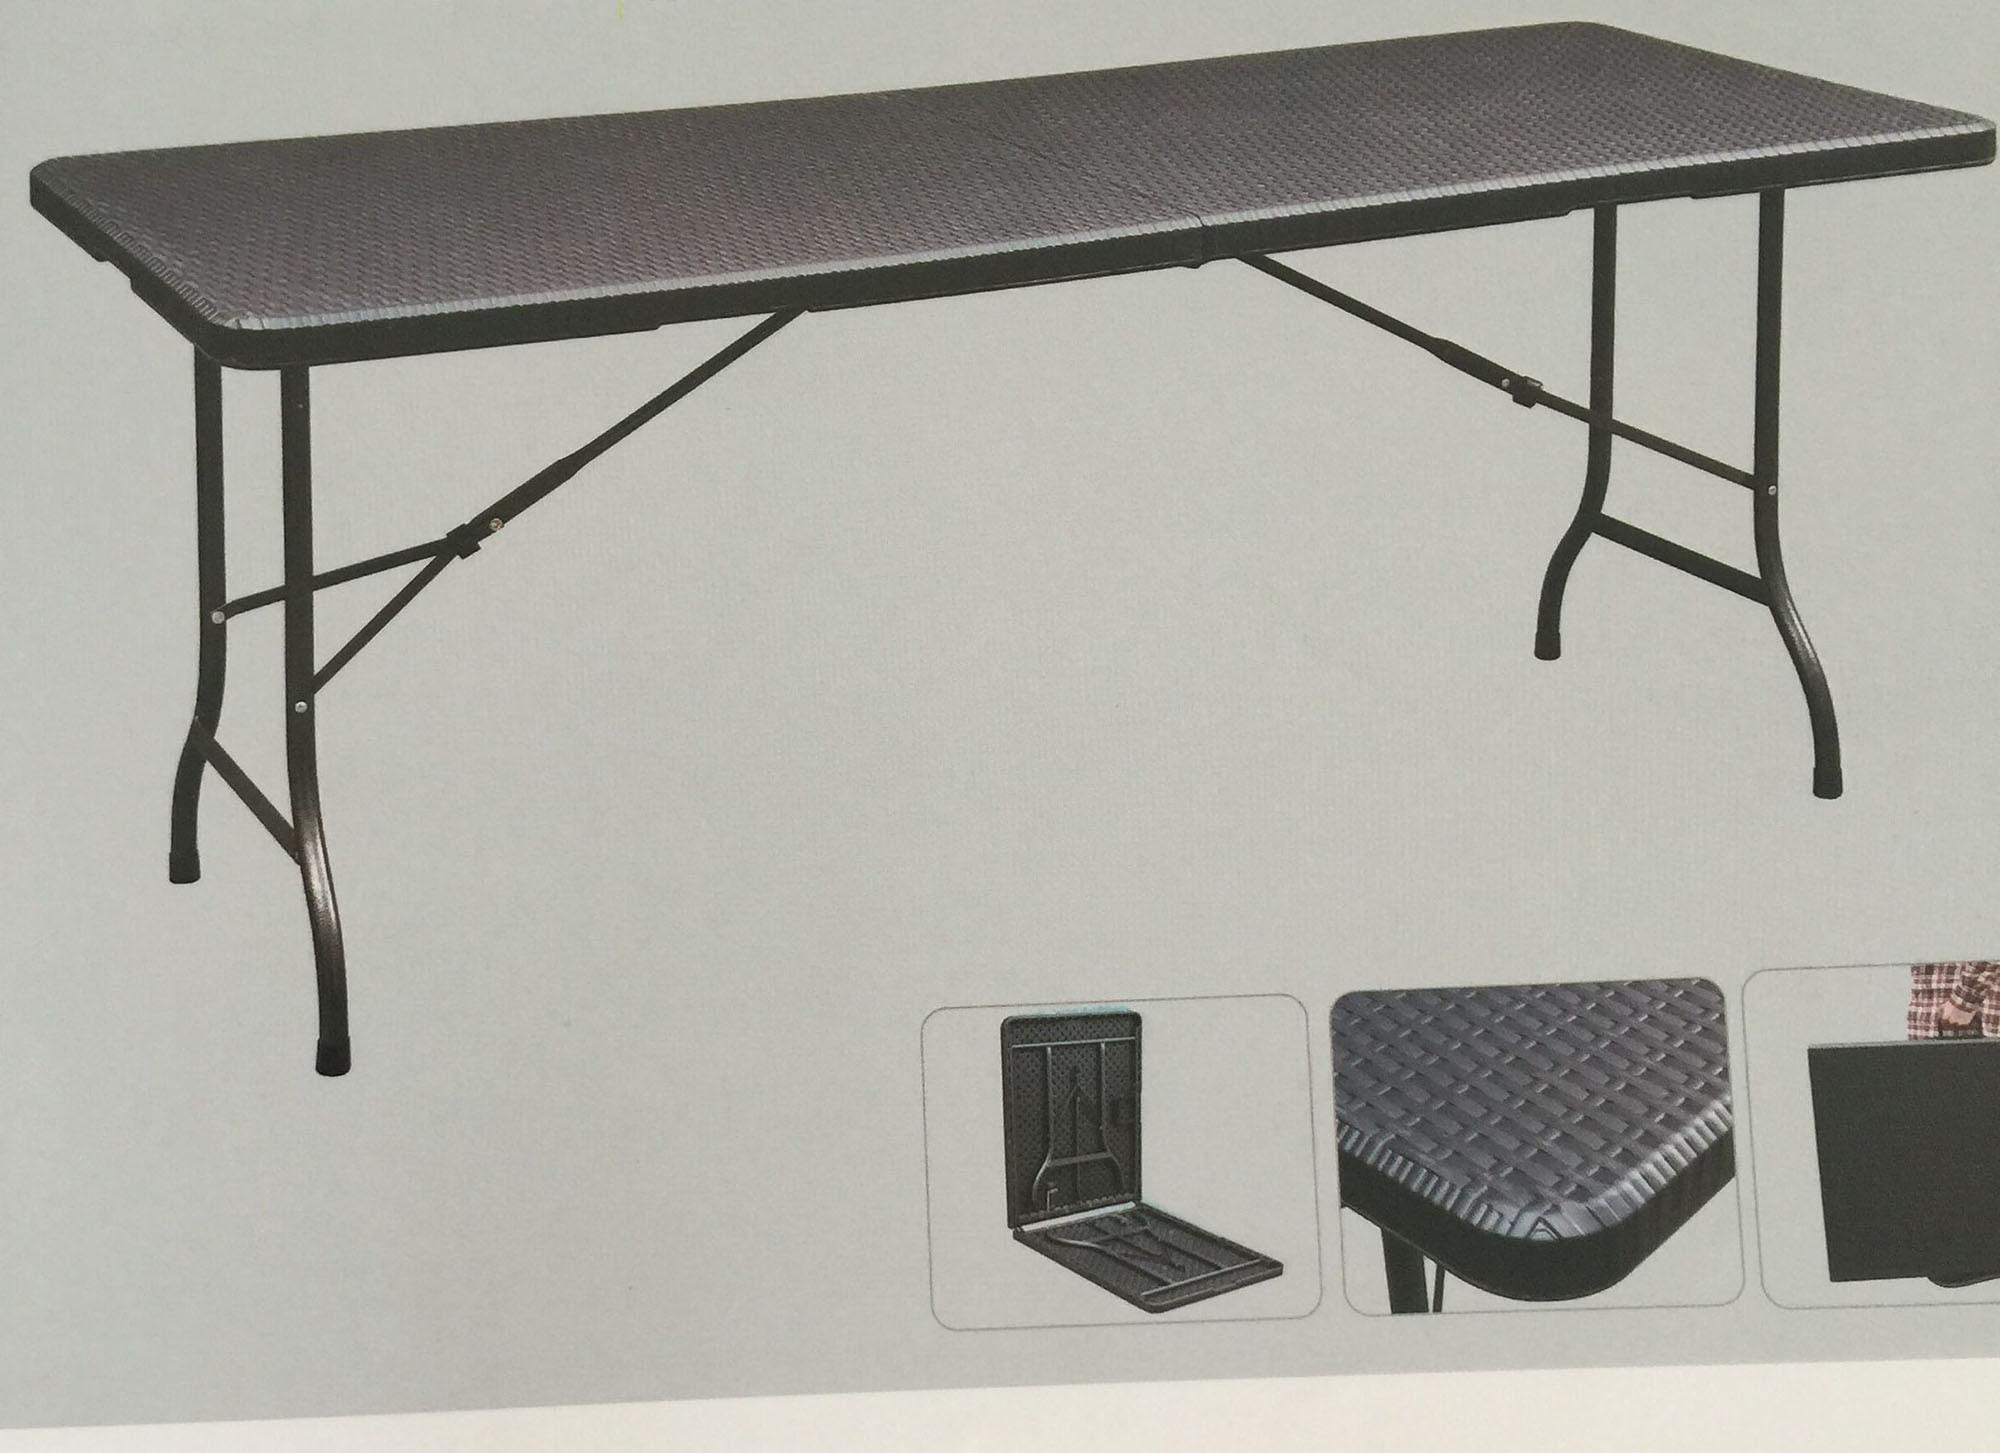 - China 6ft Plastic Folding Table Like Rattan - China Rattan Table